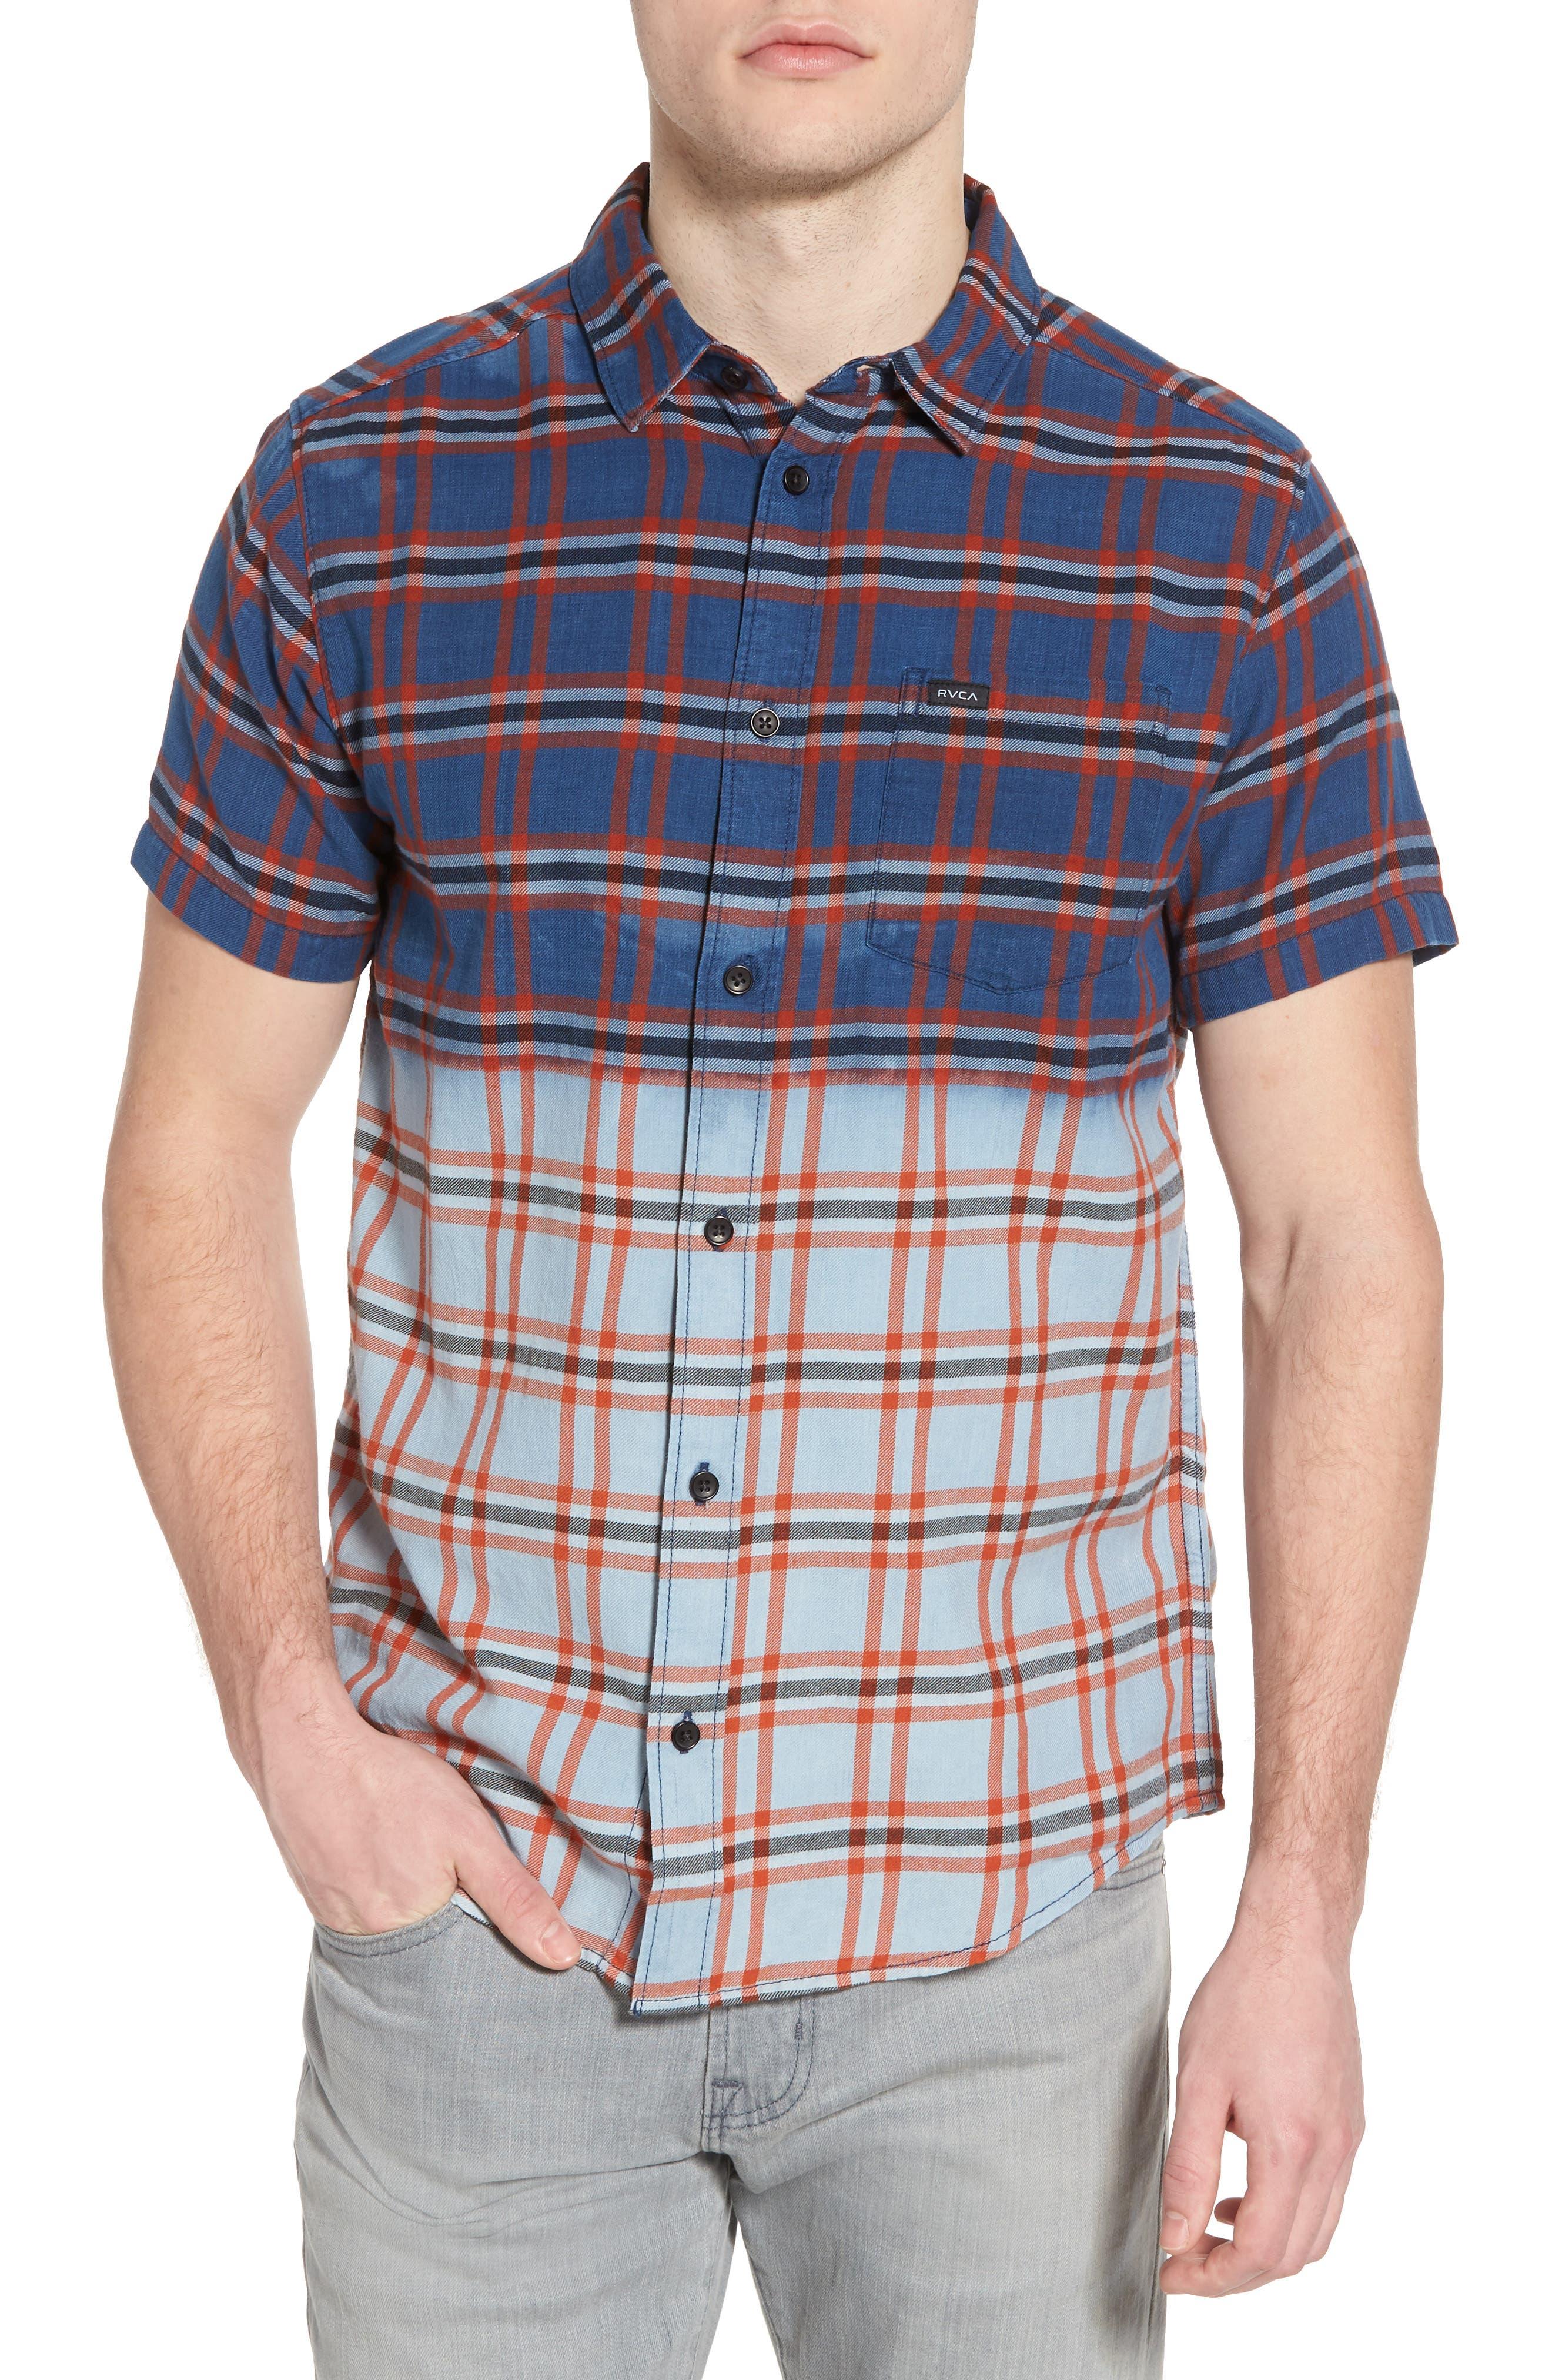 RVCA Prismatic Check Woven Shirt